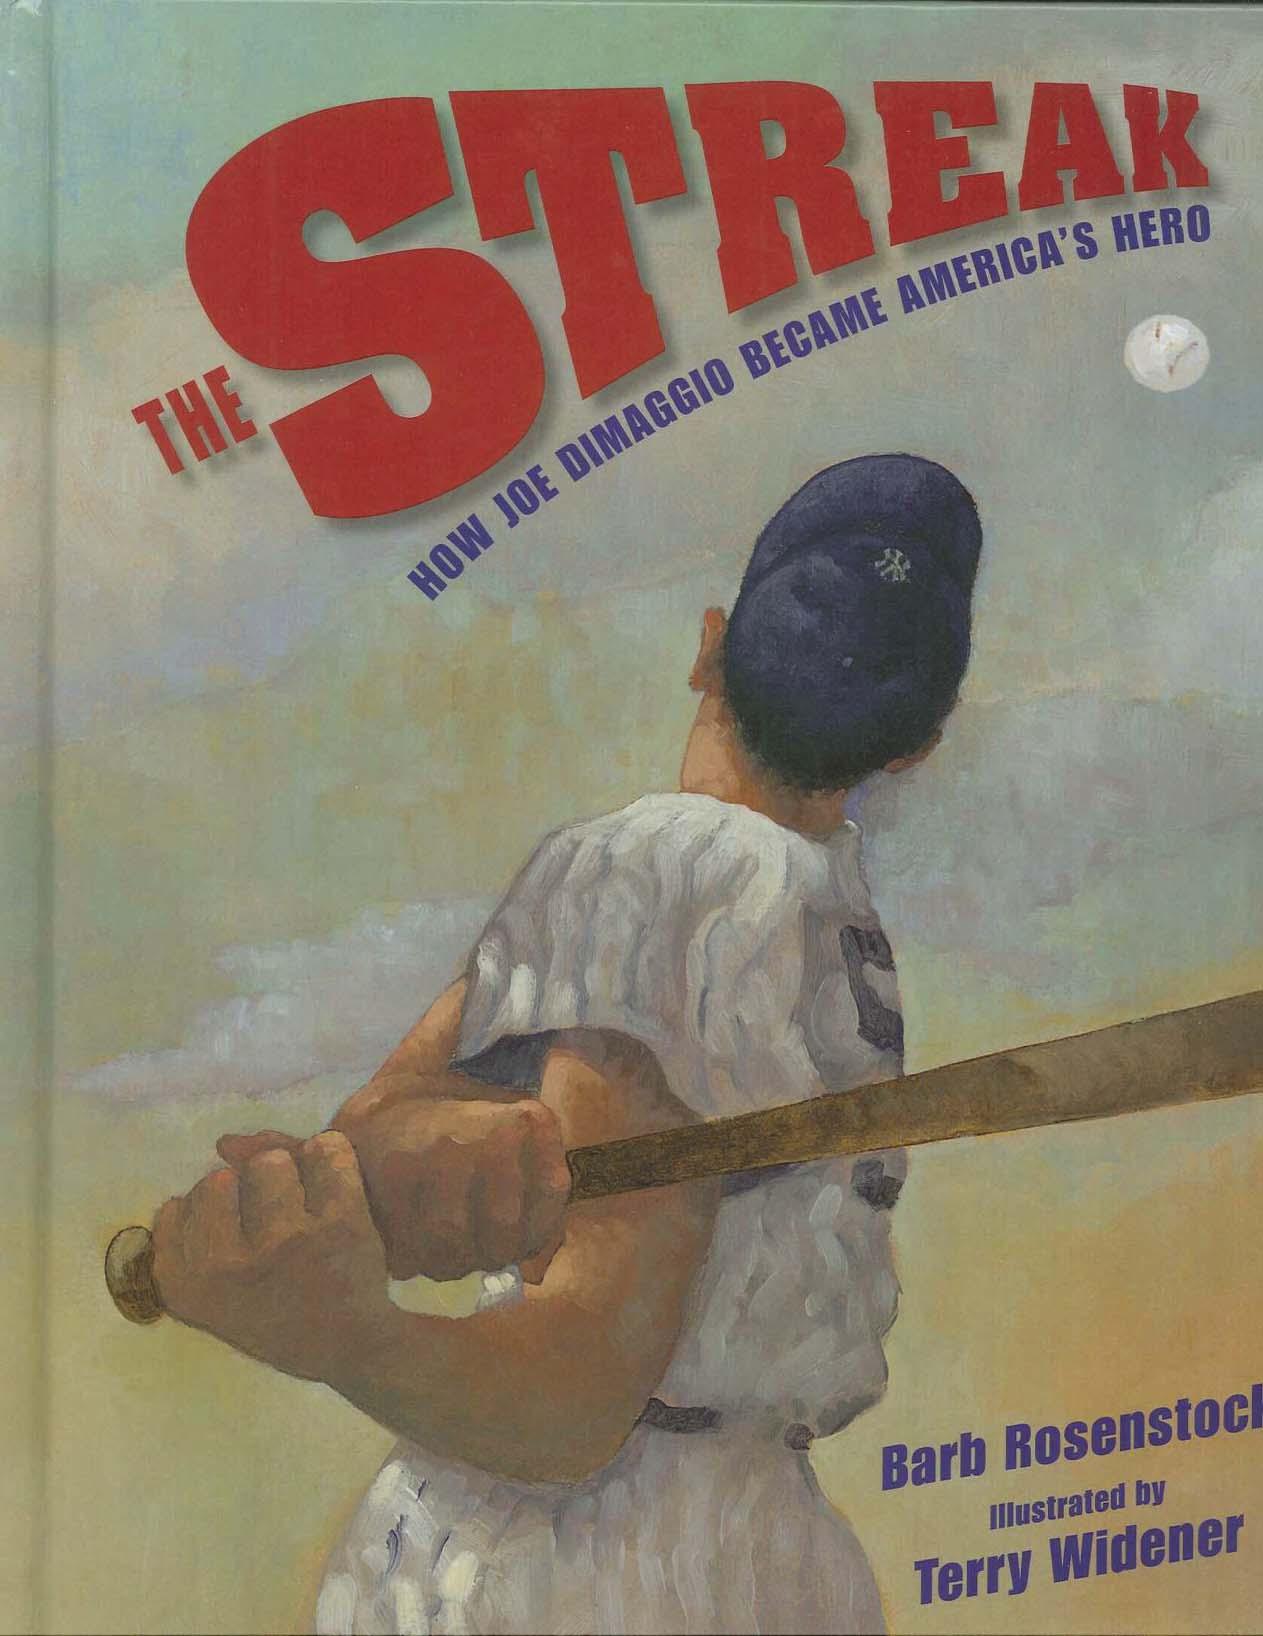 celebrate-picture-books-picture-book-review-the-streak-how-joe-dimaggio-became-america's-hero-cover